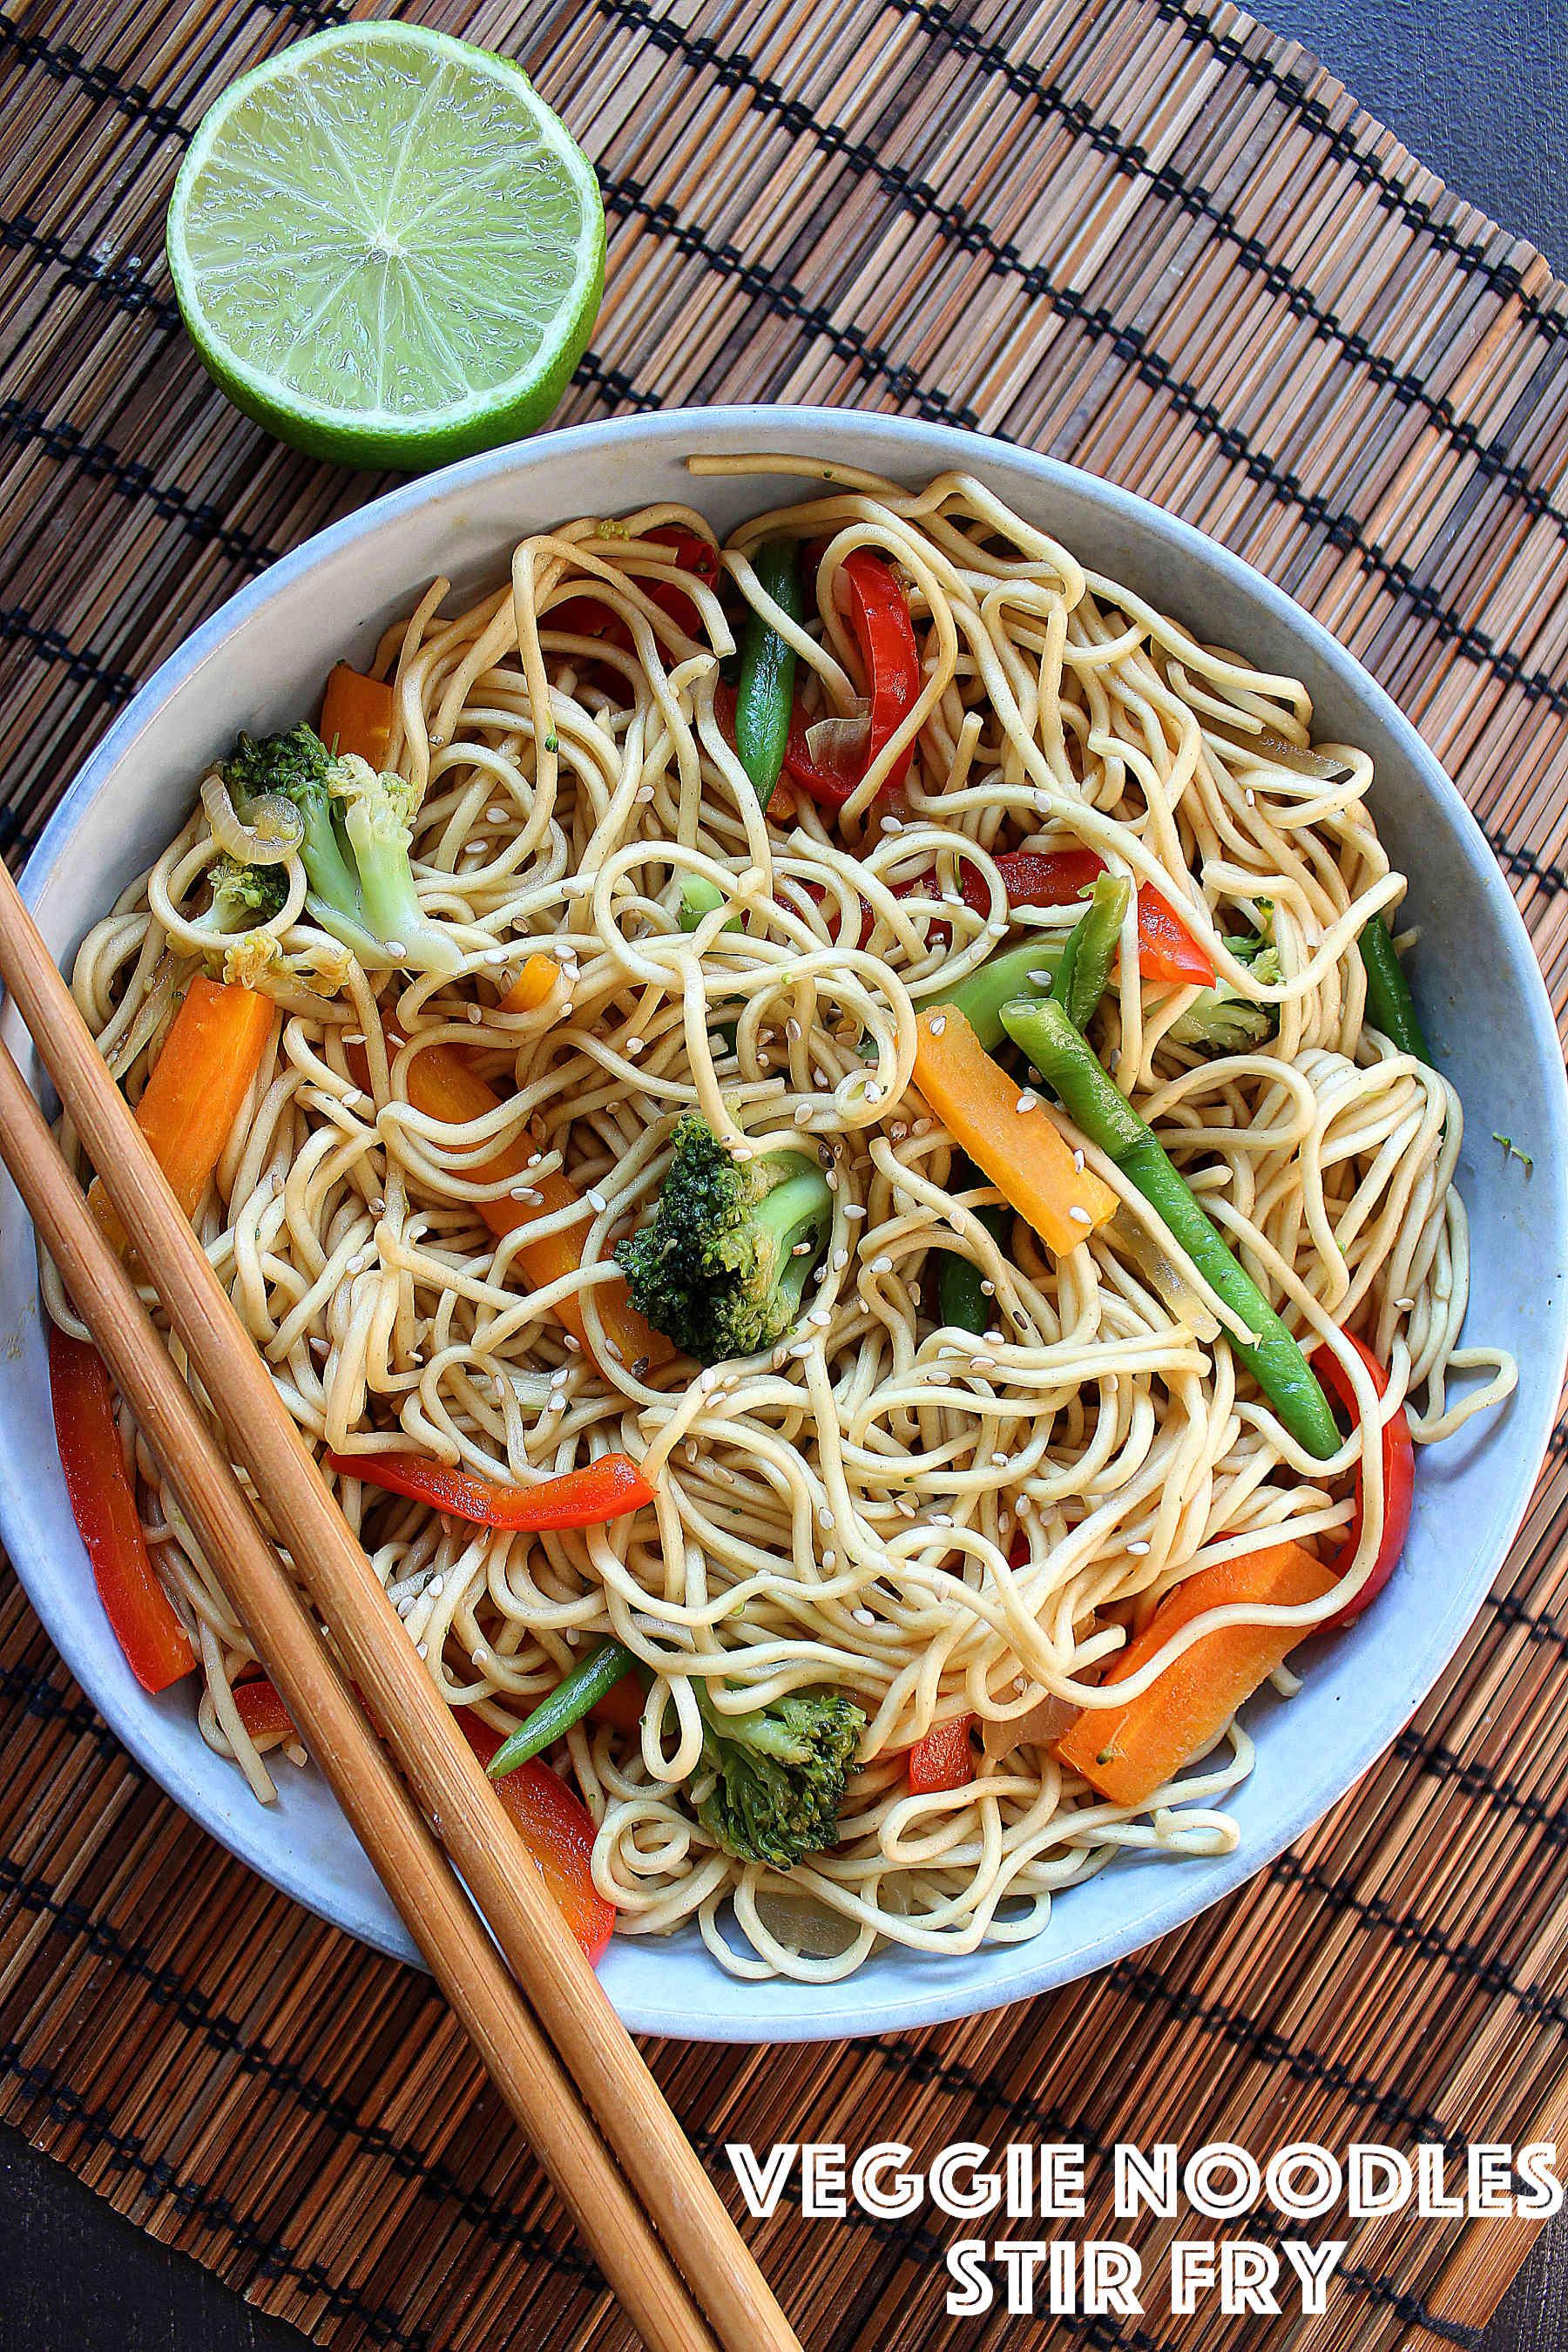 Veggie noodles stir fry